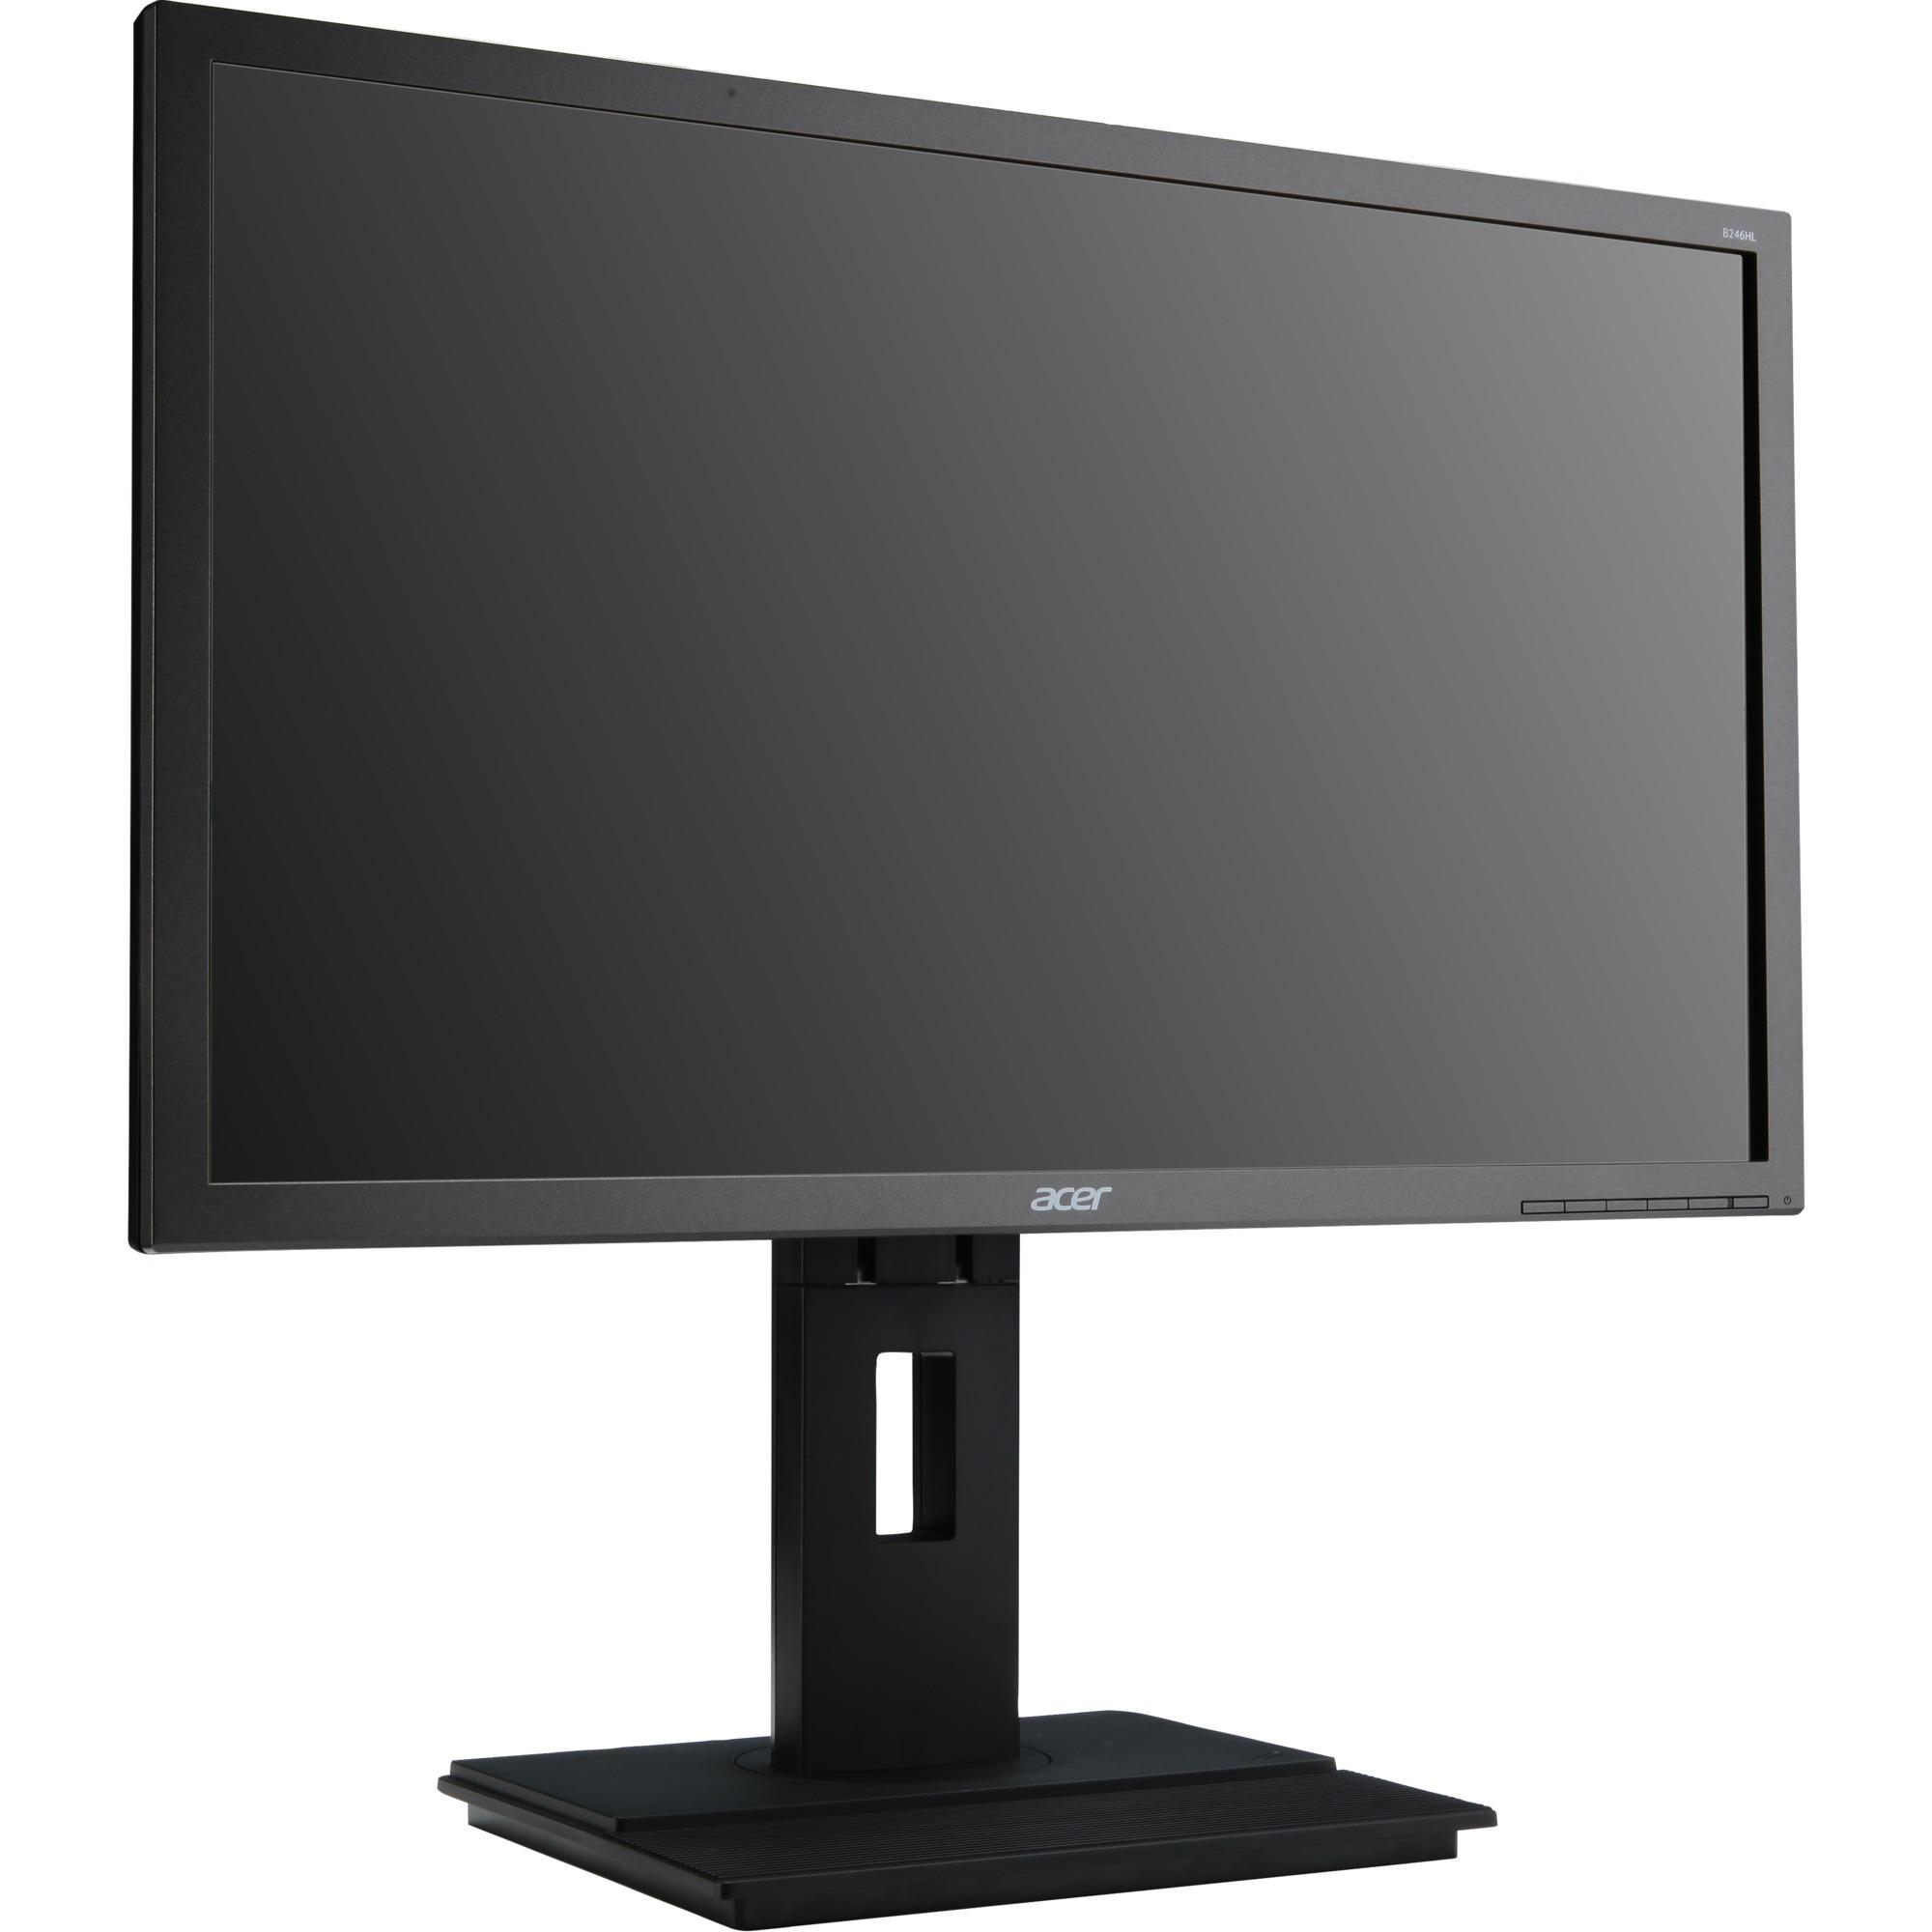 "B6 B246WLbmdprx 24"" Full HD IPS Gris pantalla para PC, Monitor LED"